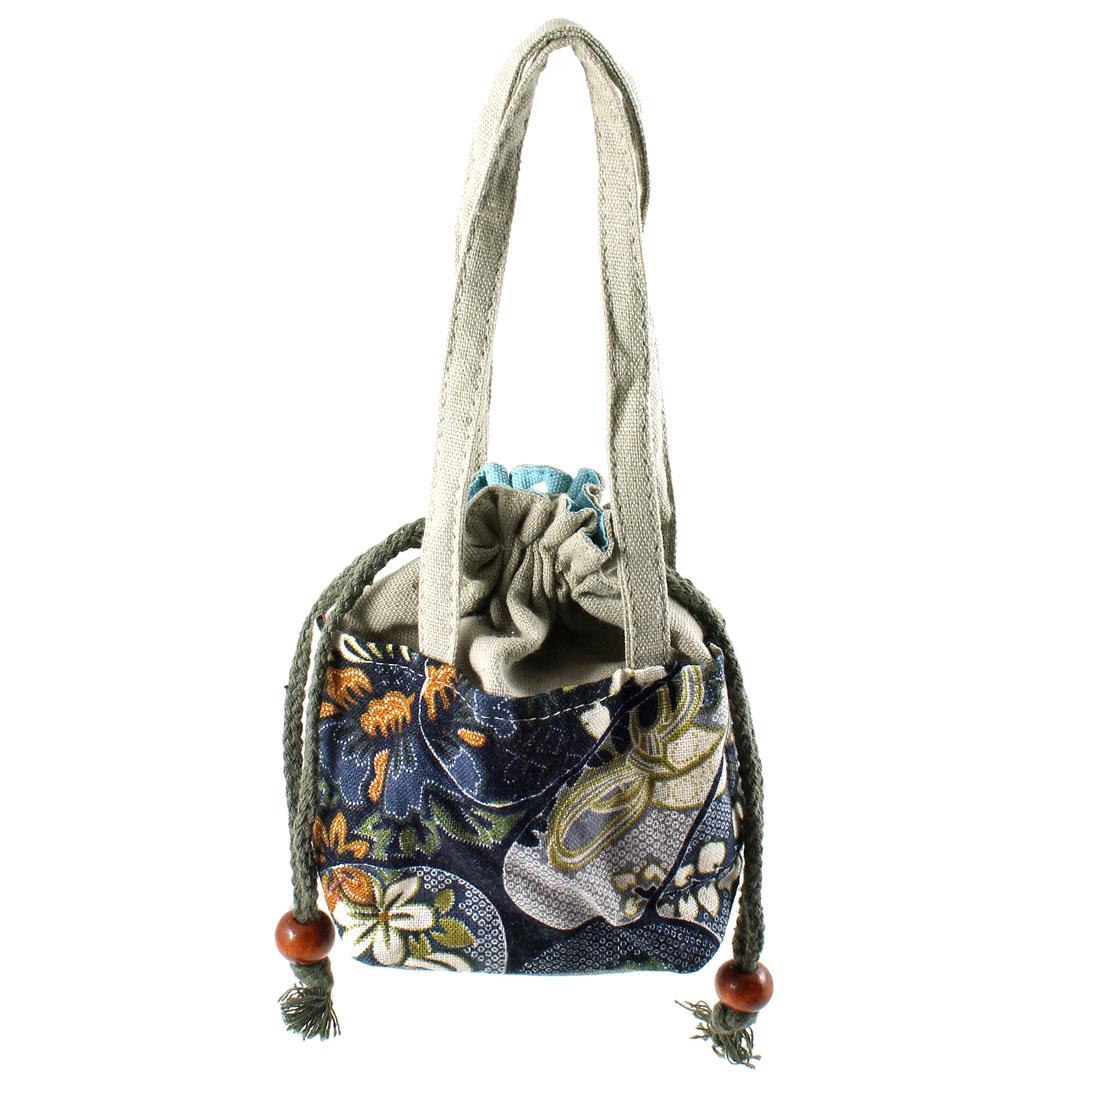 Lady Accessory Drawstring Design Navy Blue Novelty Prints Handbag Tote Bag Gray